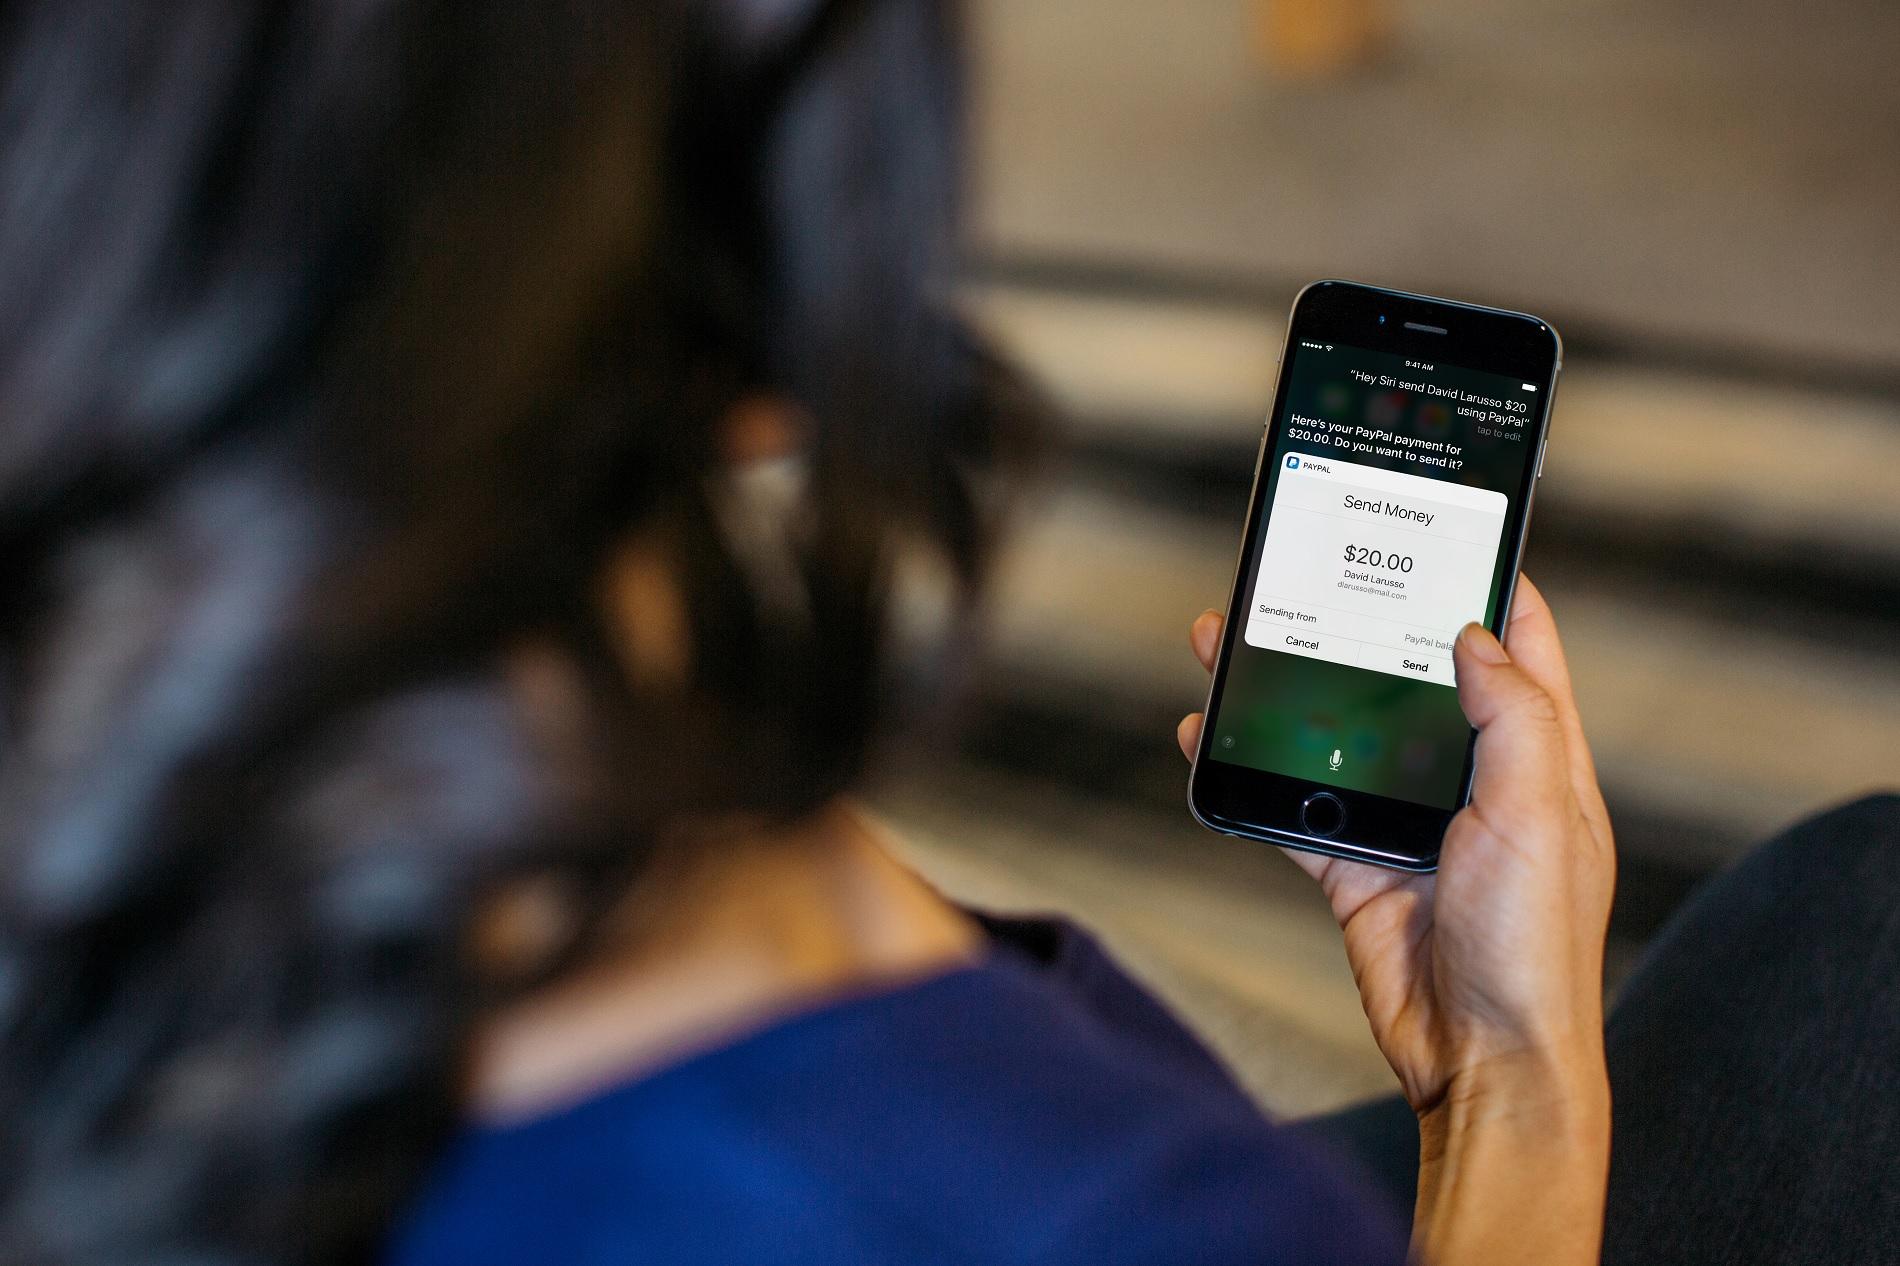 Telling Siri to send money through PayPal.